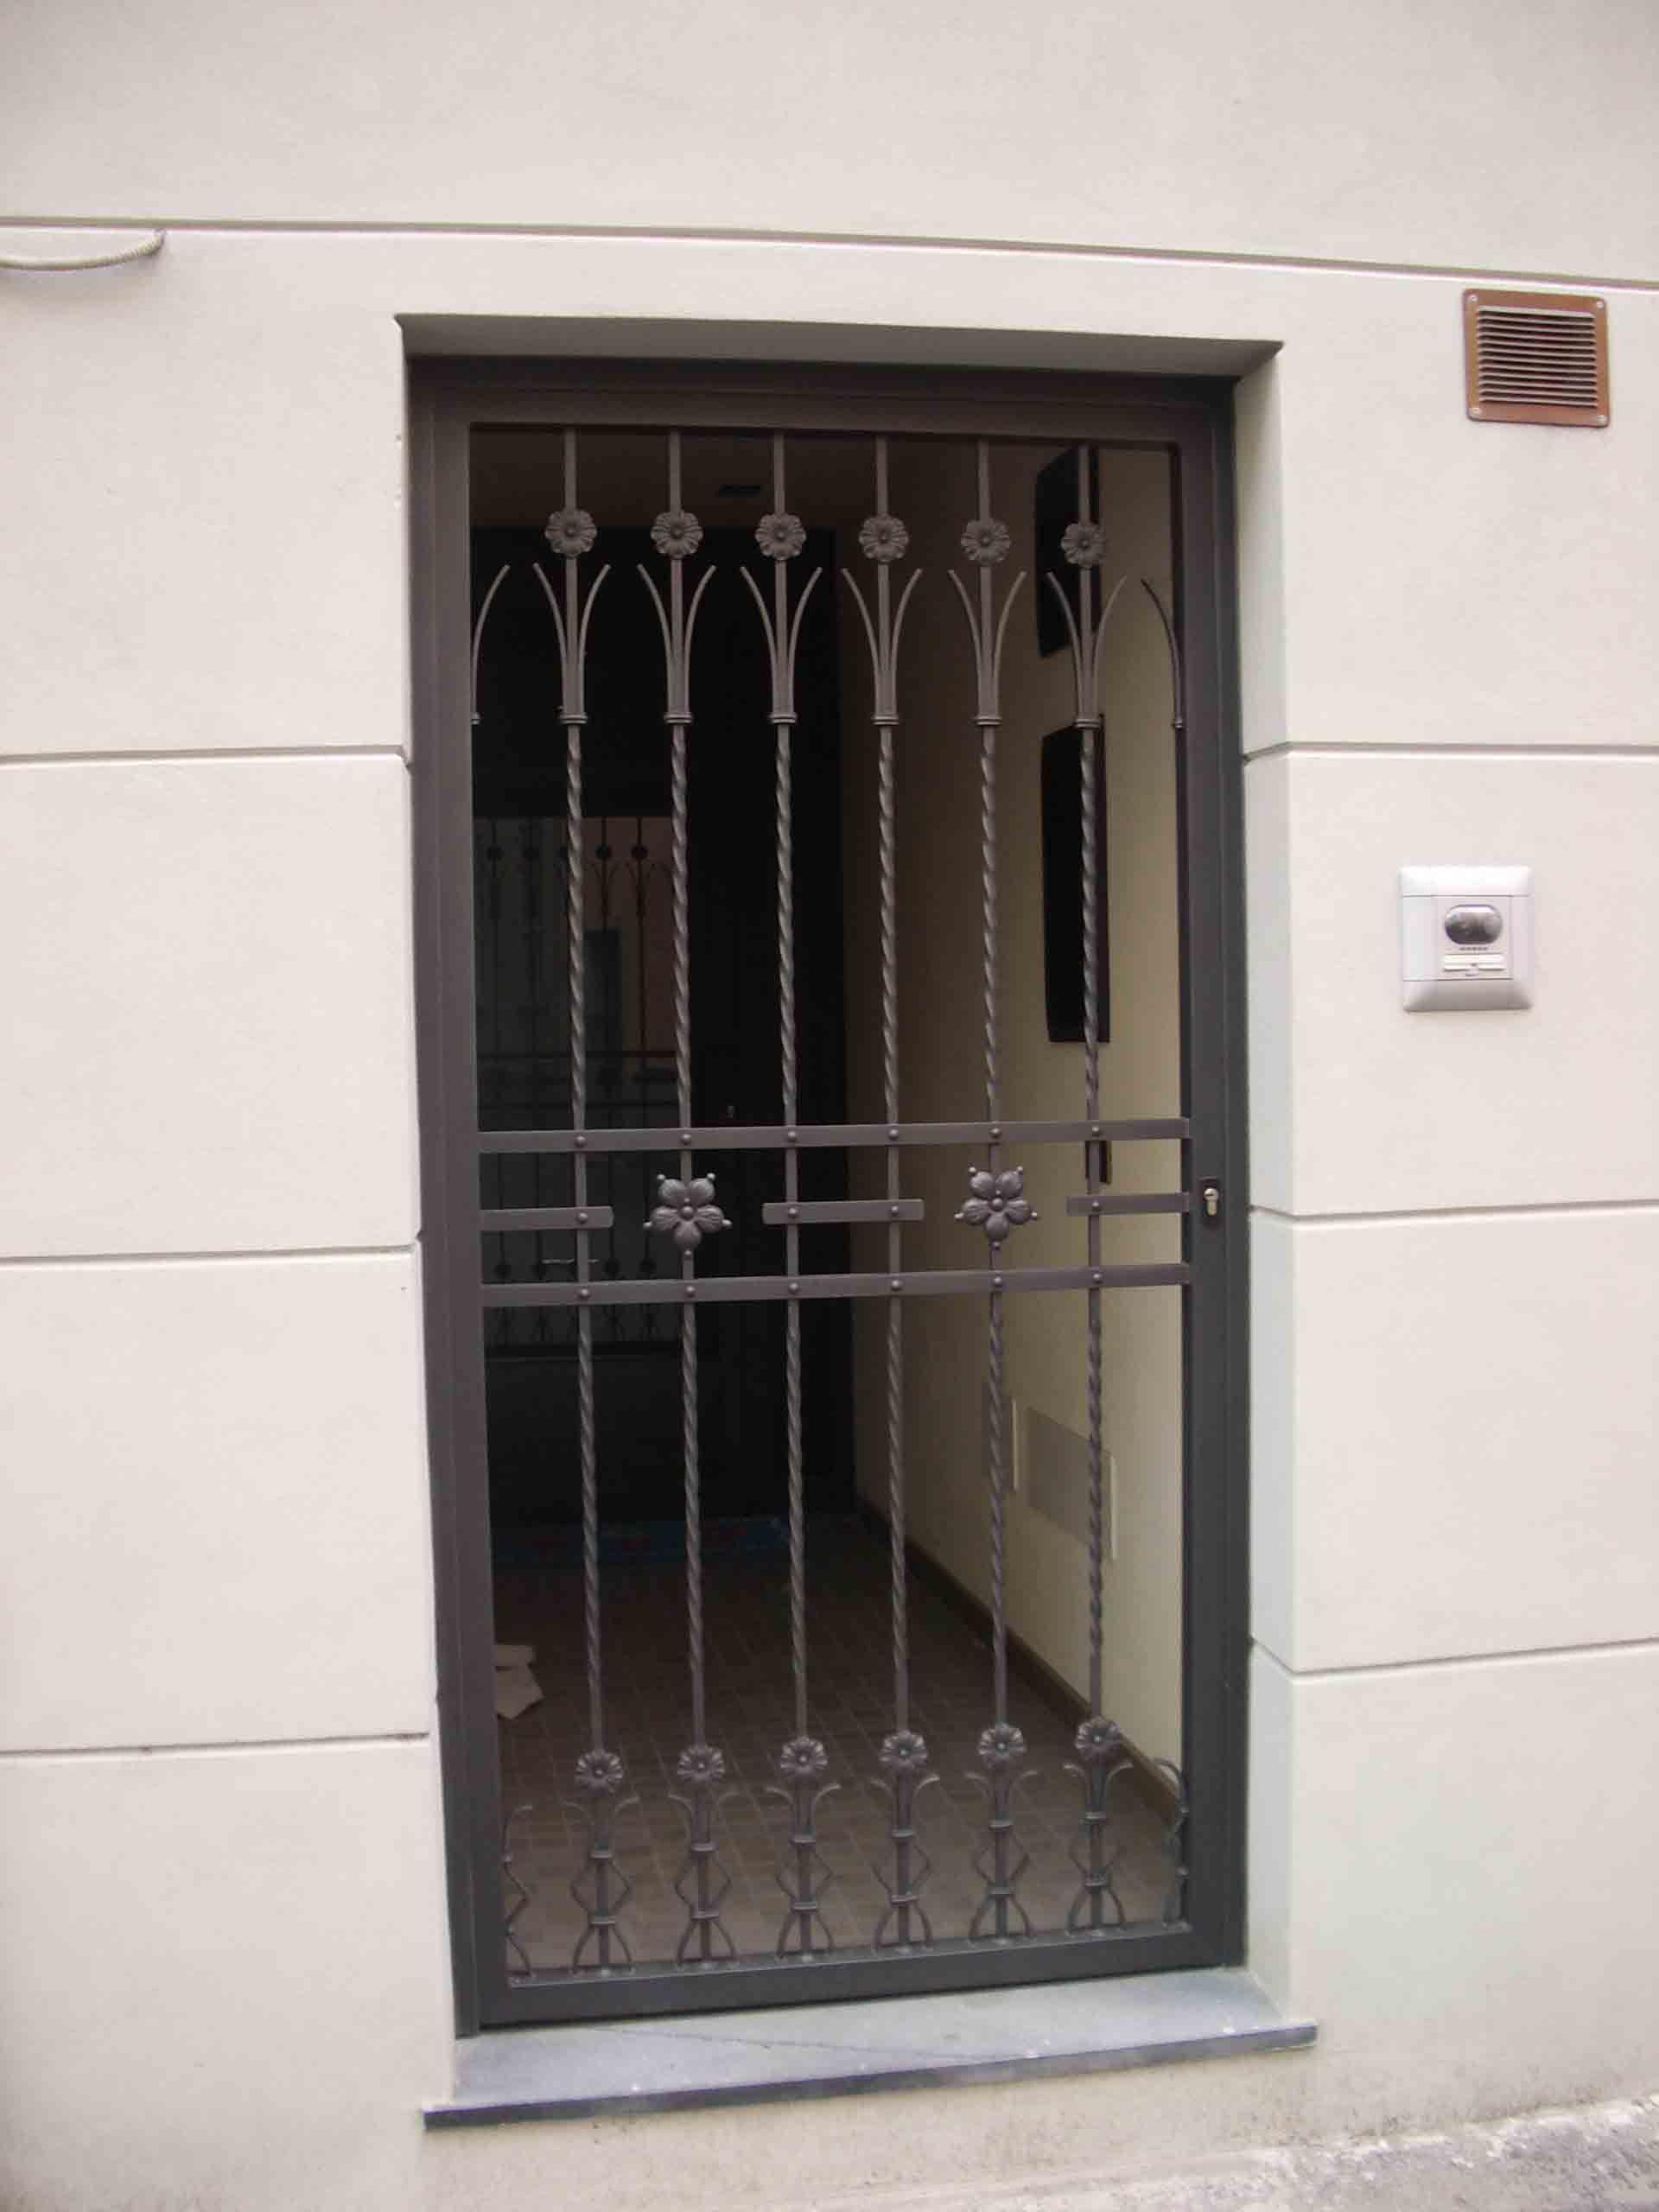 Immagine correlata porta finestre pinterest - Inferriata porta ...